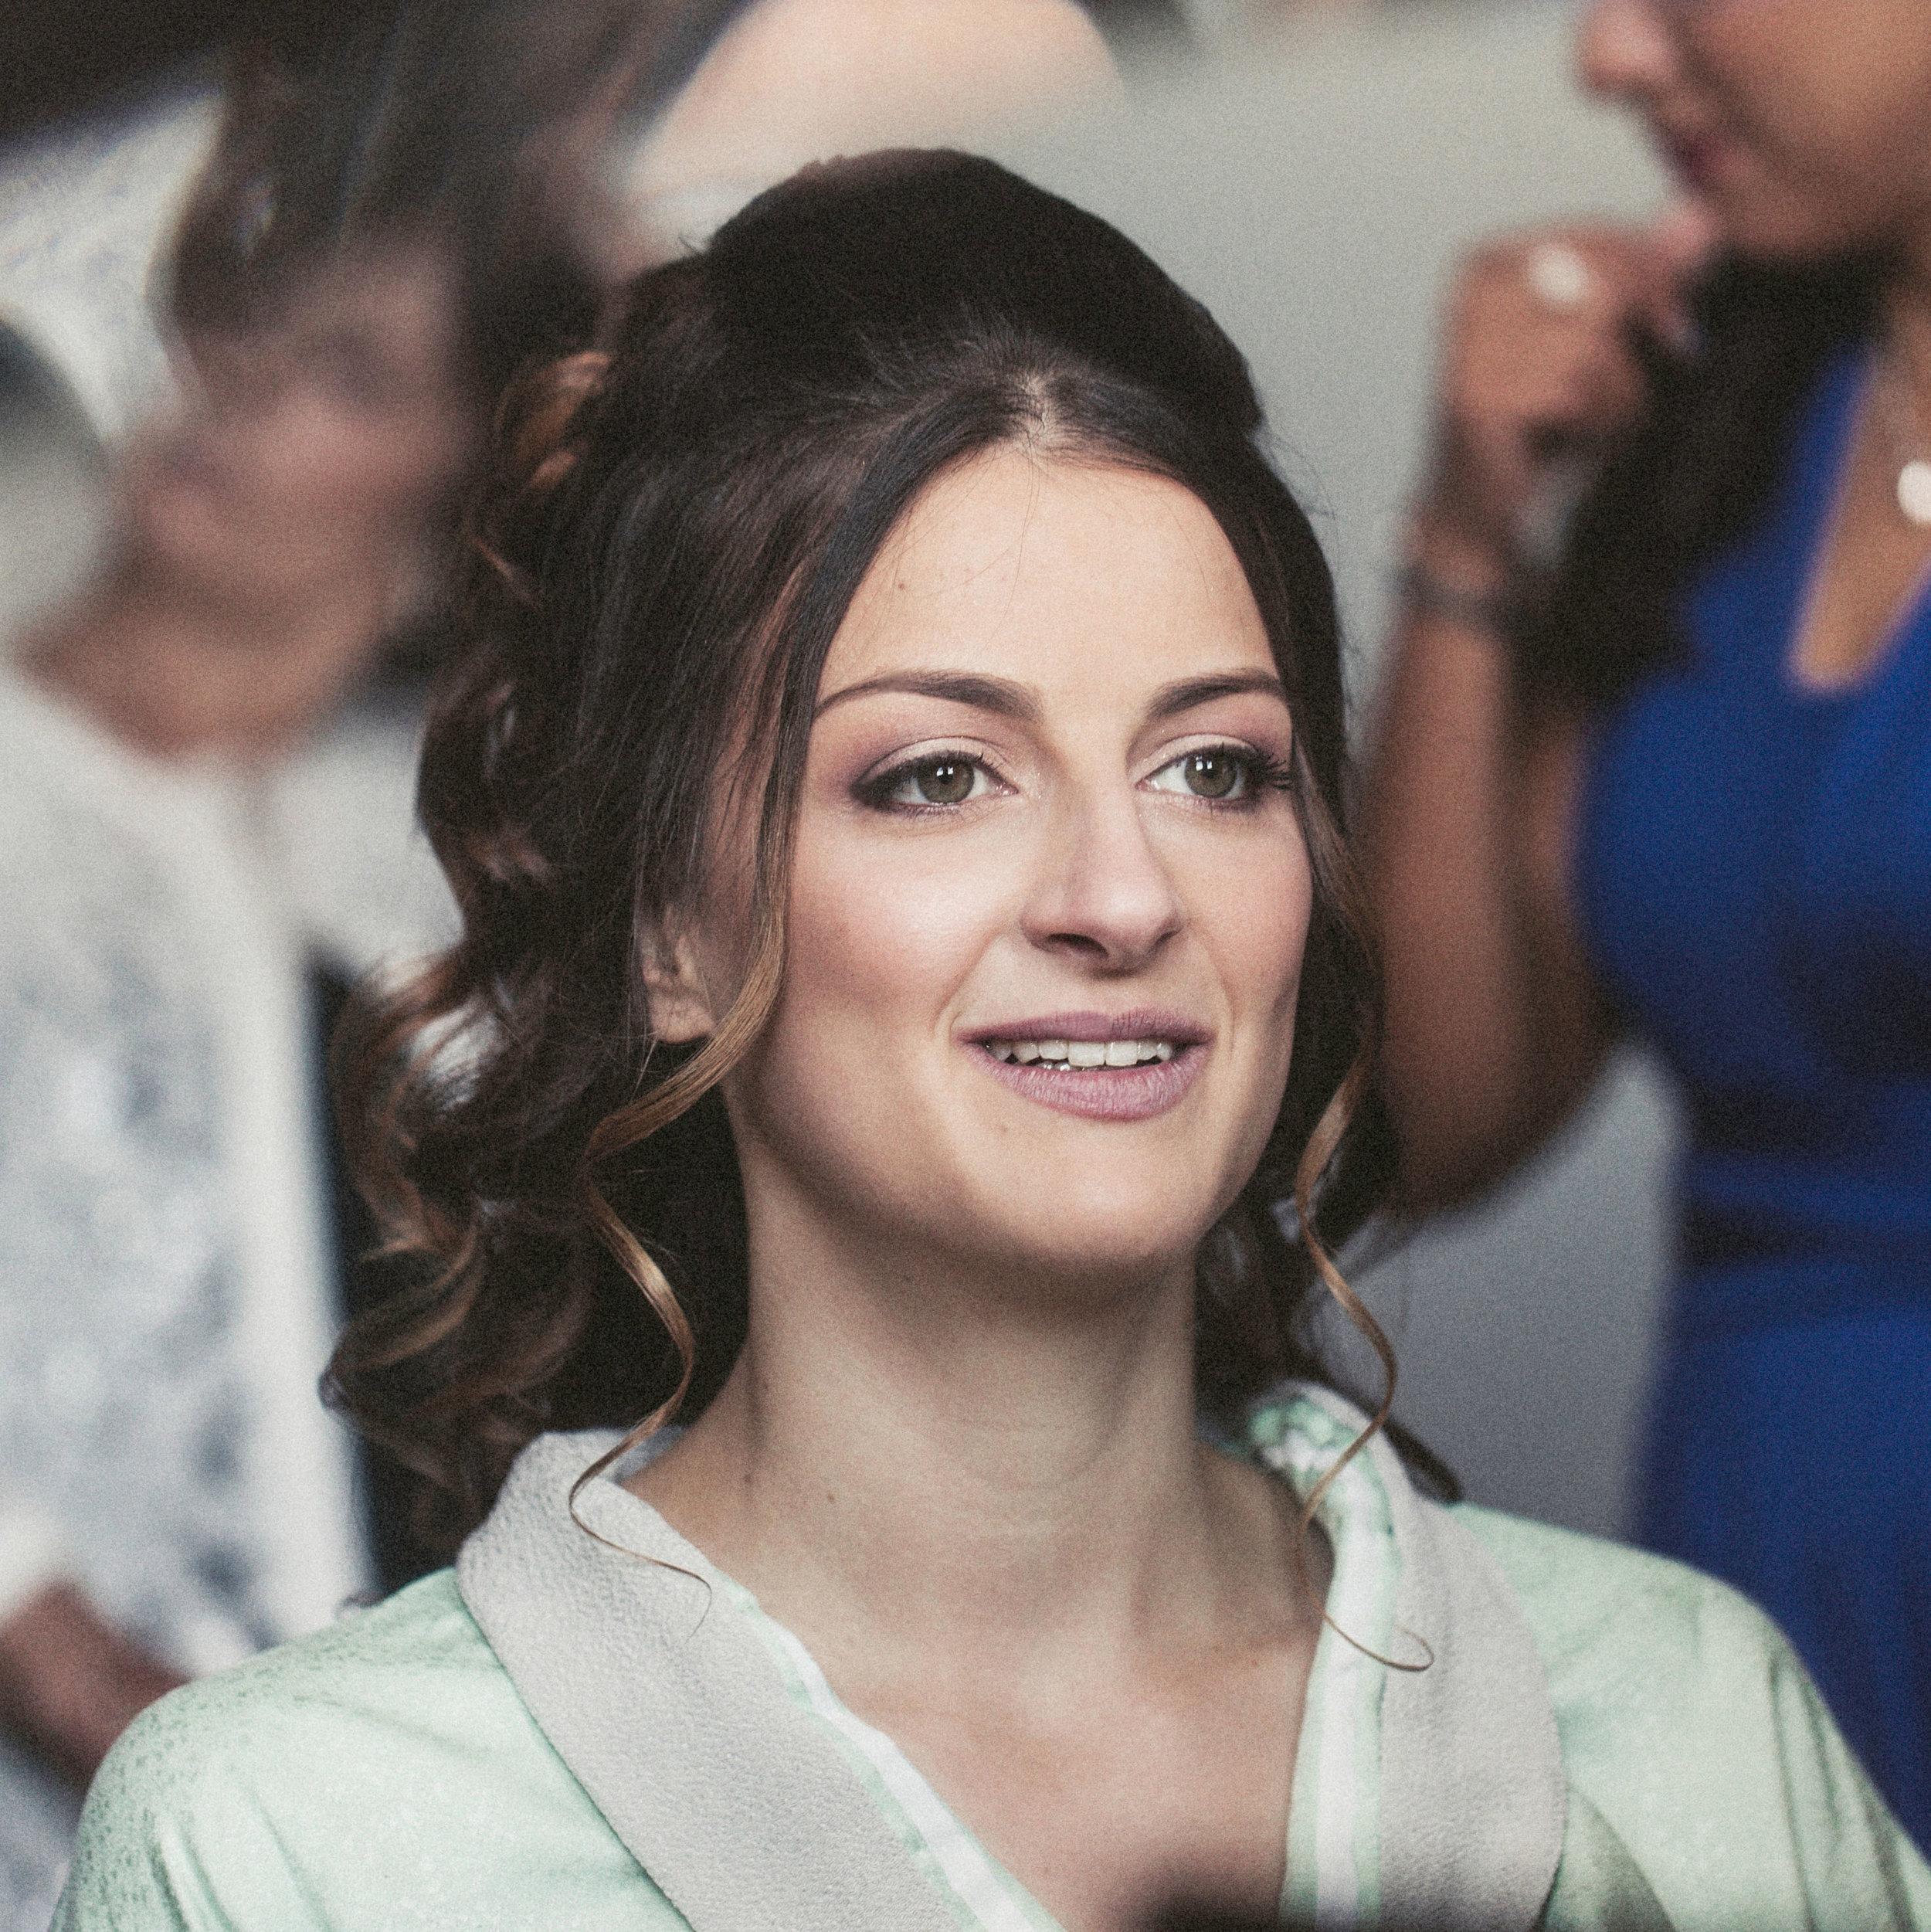 Emcheto makeup+maquilleuse+Grenoble+Isère+Rhone Alpes+mariage.jpg